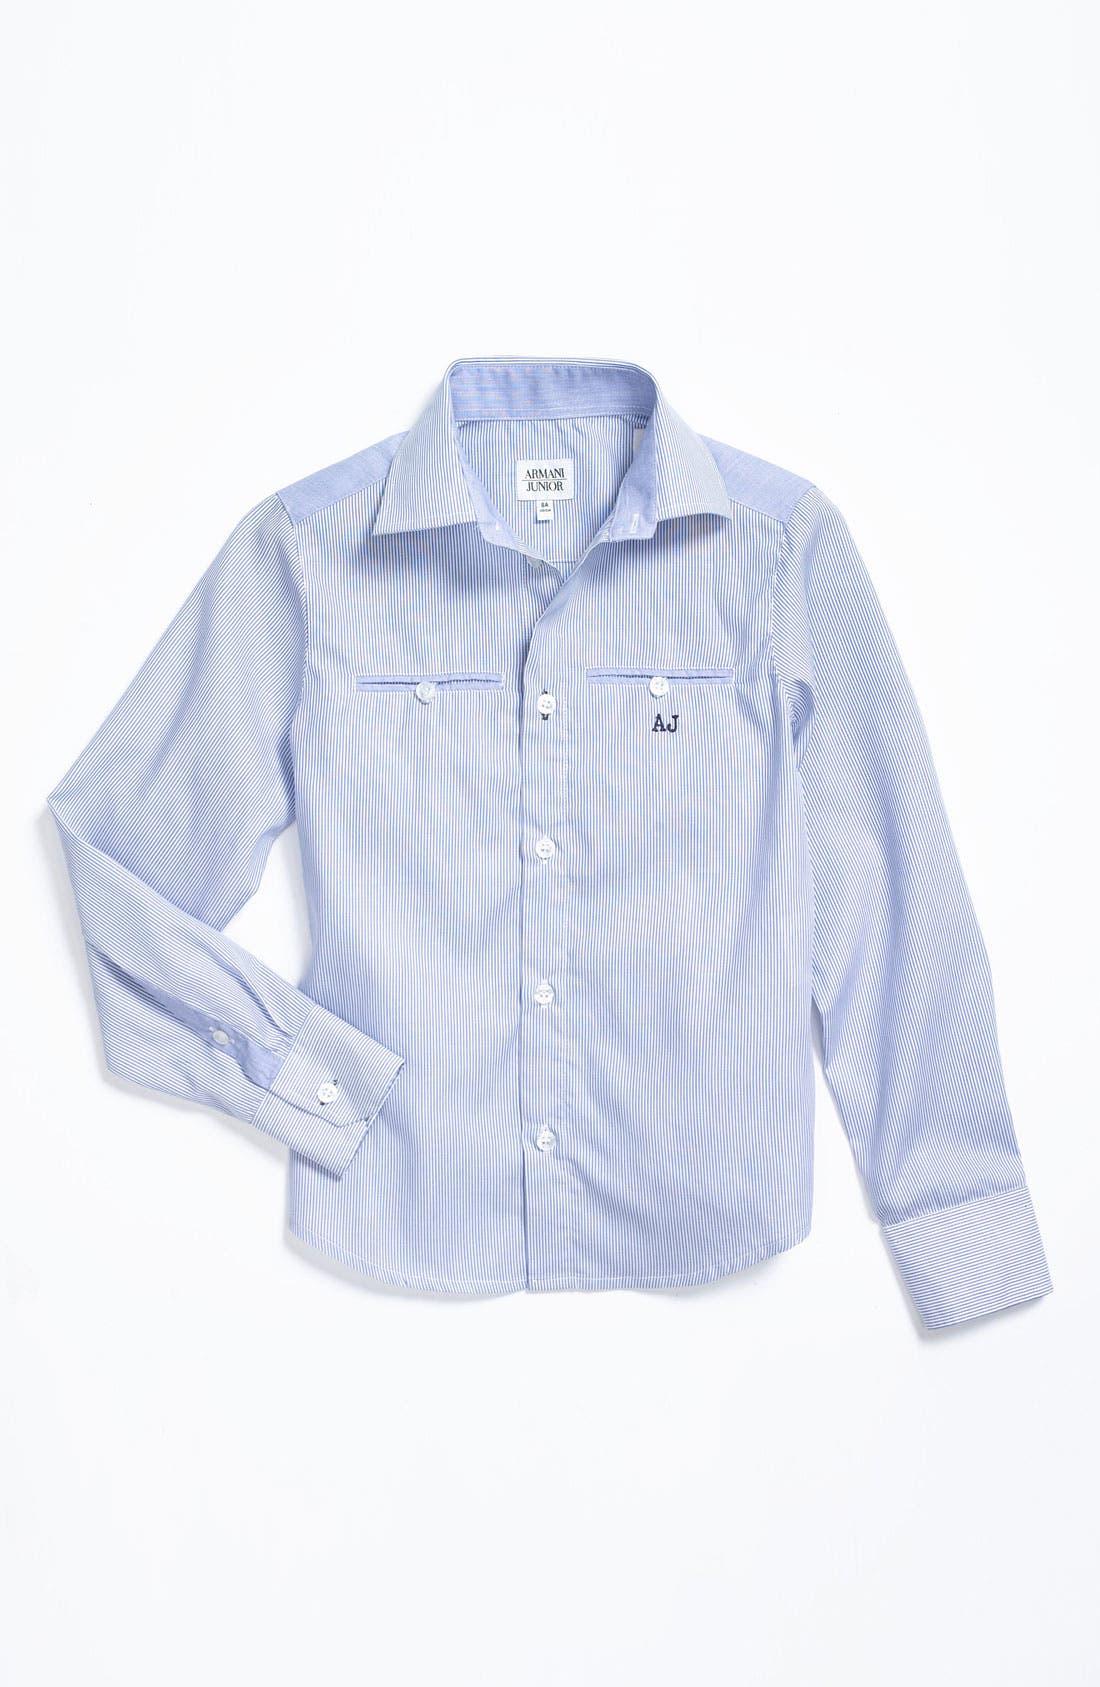 Alternate Image 1 Selected - Armani Junior Dress Shirt (Big Boys)